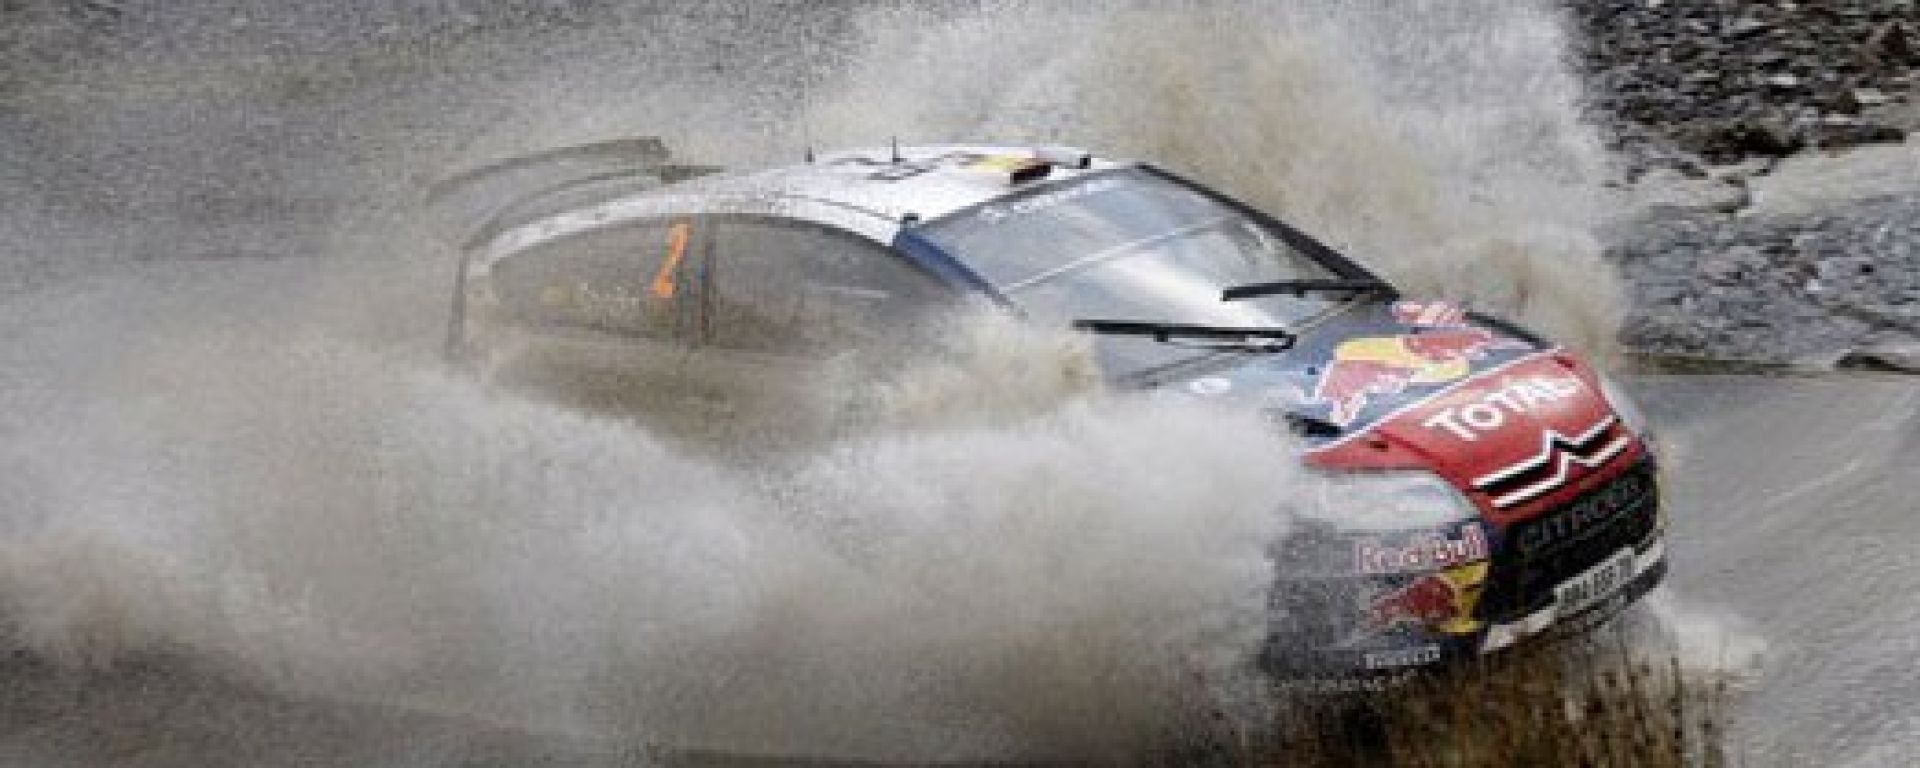 Campionato WRC Seconda Parte